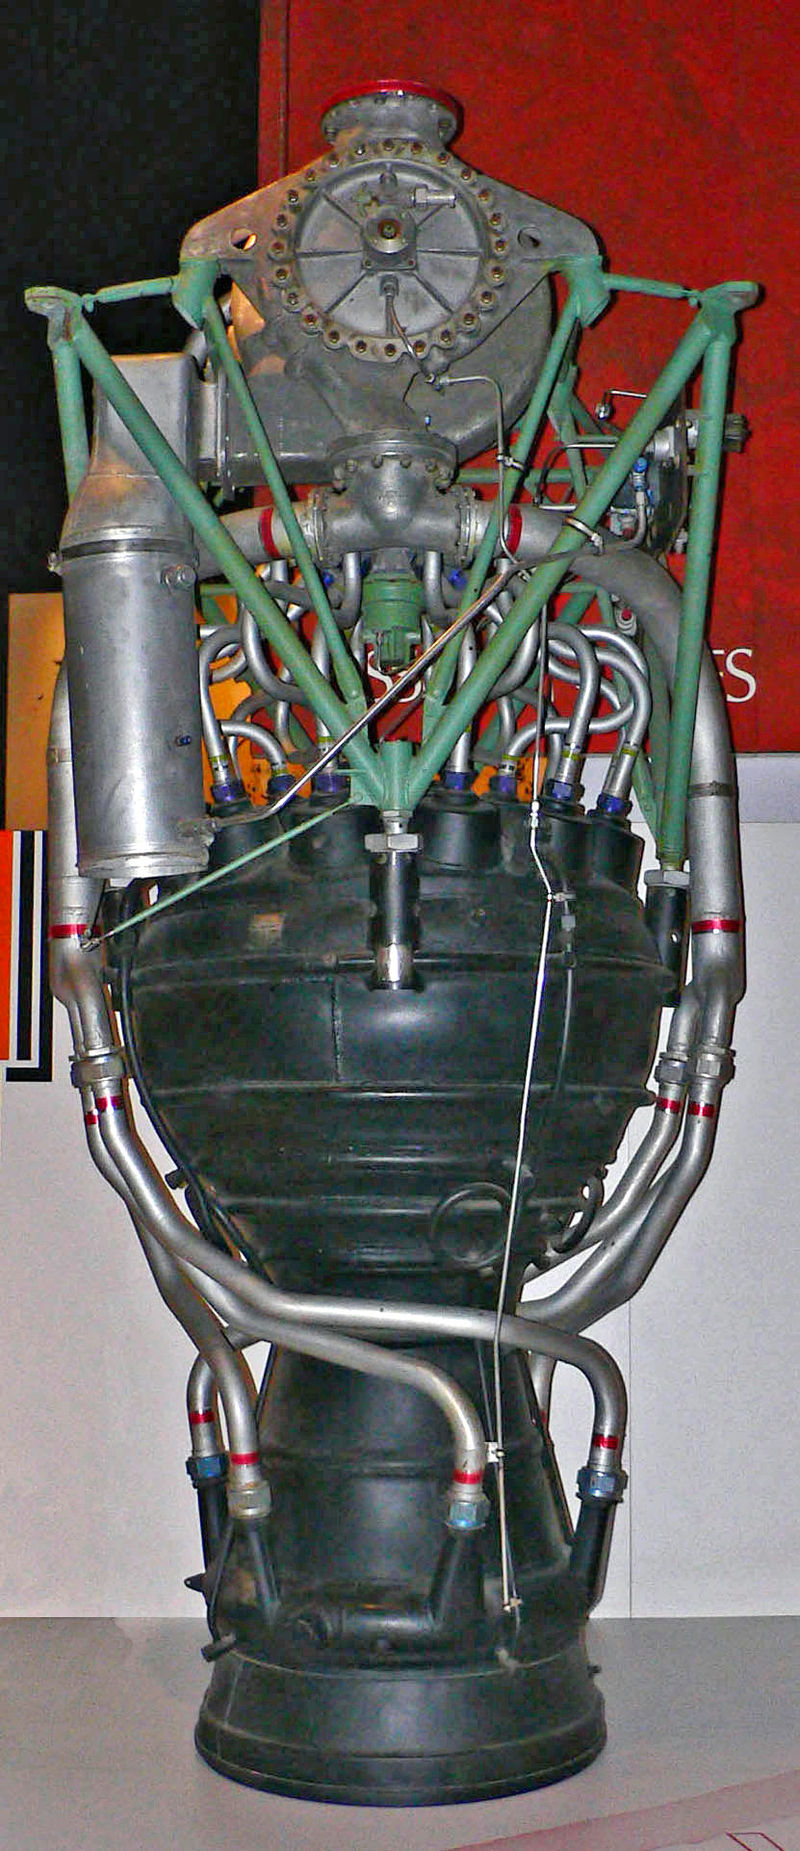 v-2火箭发动机结构